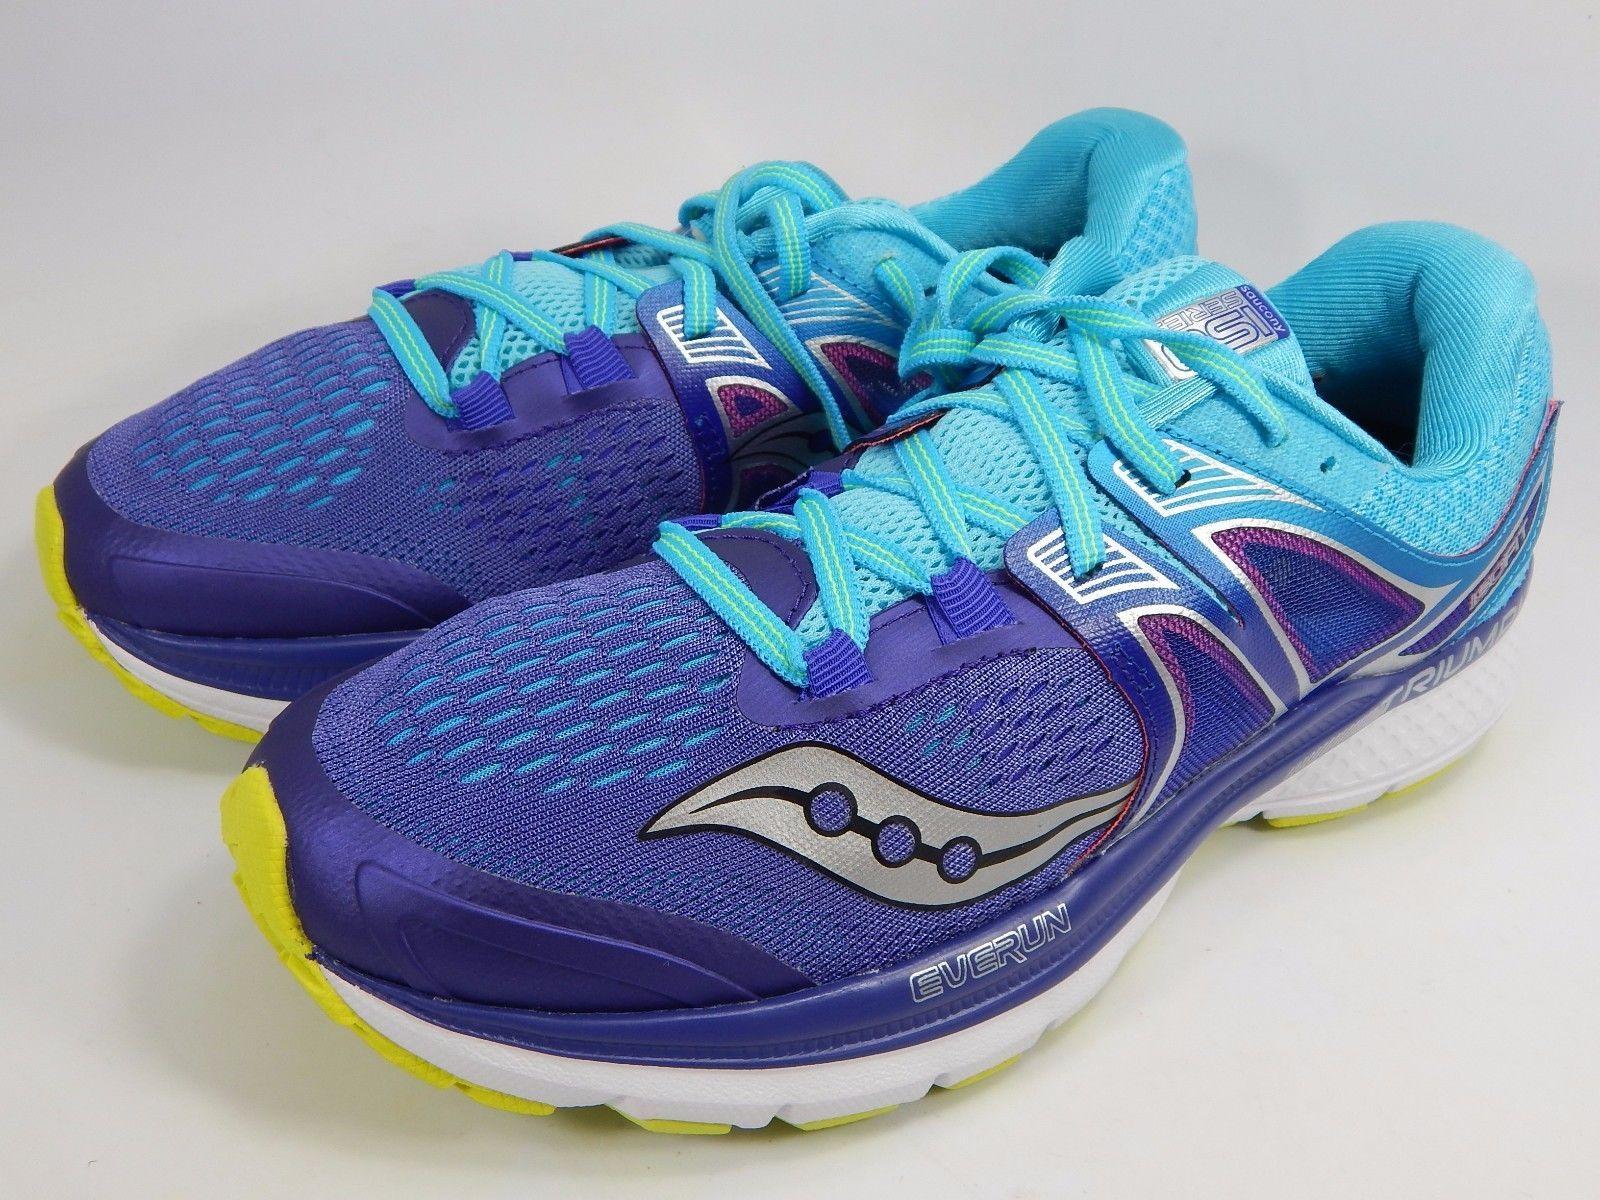 Saucony Triumph ISO 3 Women's Running Shoes Sz US 9.5 M (B) EU 41 Blue S10346-1